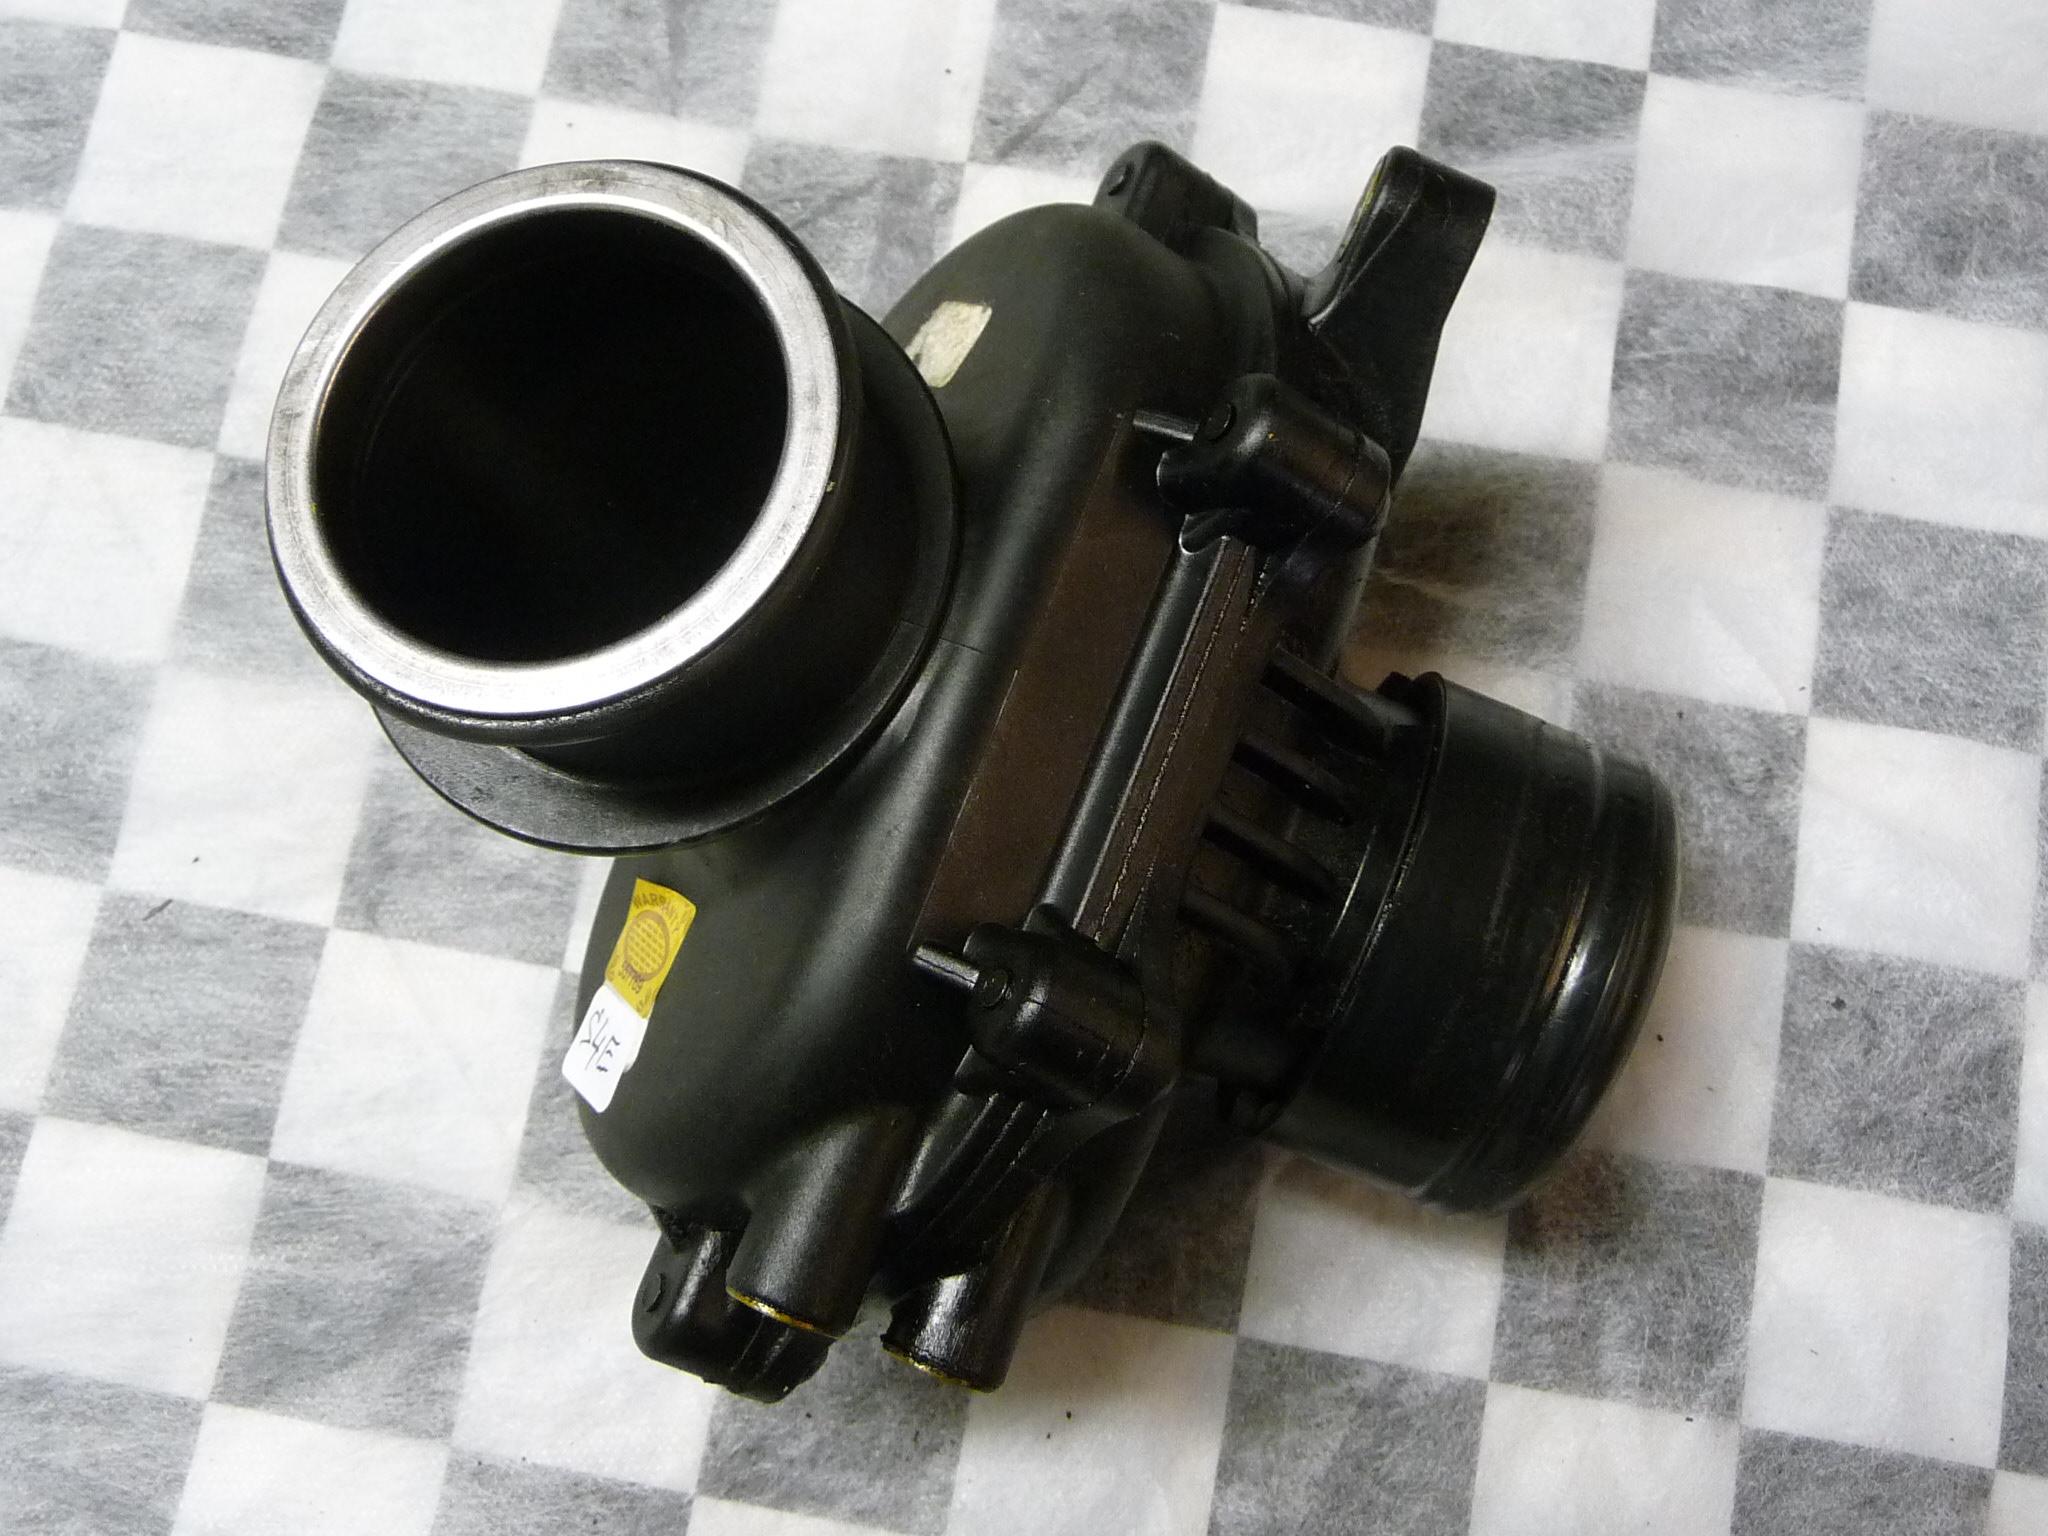 Mercedes Benz Sprinter 2500 Engine Air Intake Resonator A6421403087 OEM OE